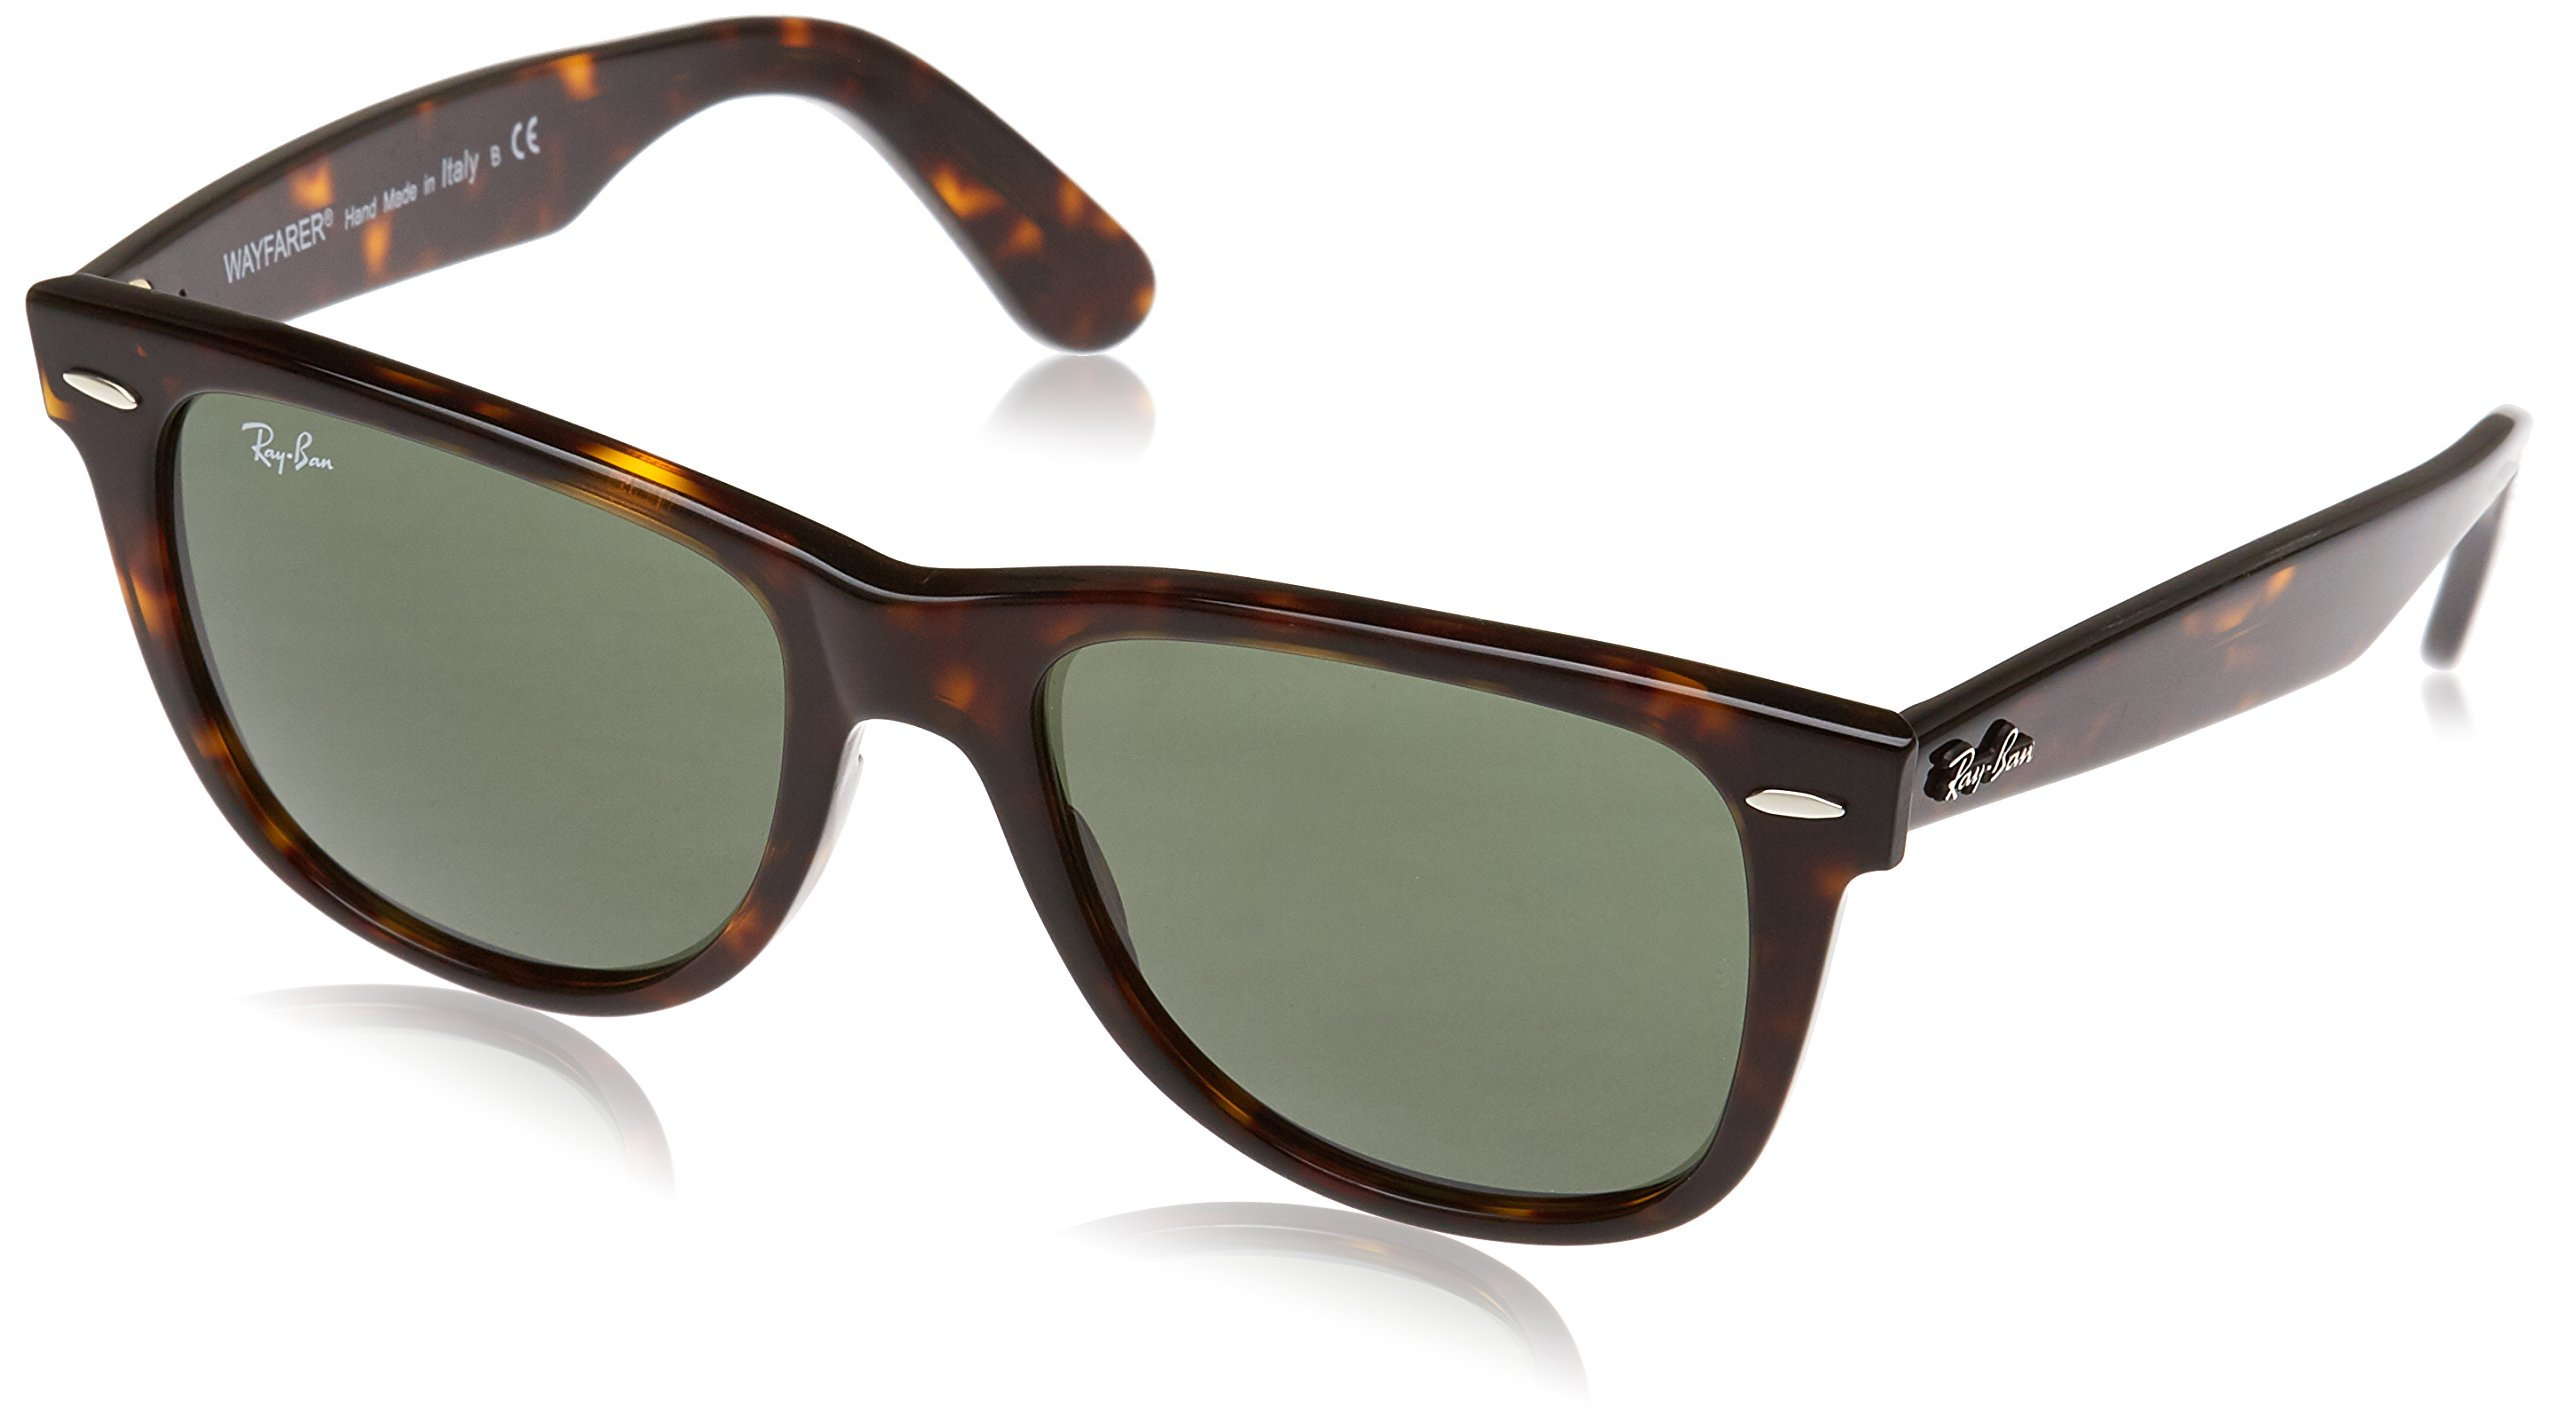 Ray-Ban, RB2140 Original Wayfarer Sunglasses, Unisex Ray-Ban Glasses, 100% UV Protection, Non-Polarized, Reduce Eye Strain, Lightweight Acetate Frame, Prescription-Ready Lenses, 54 mm Frame by Ray-Ban (Image #1)